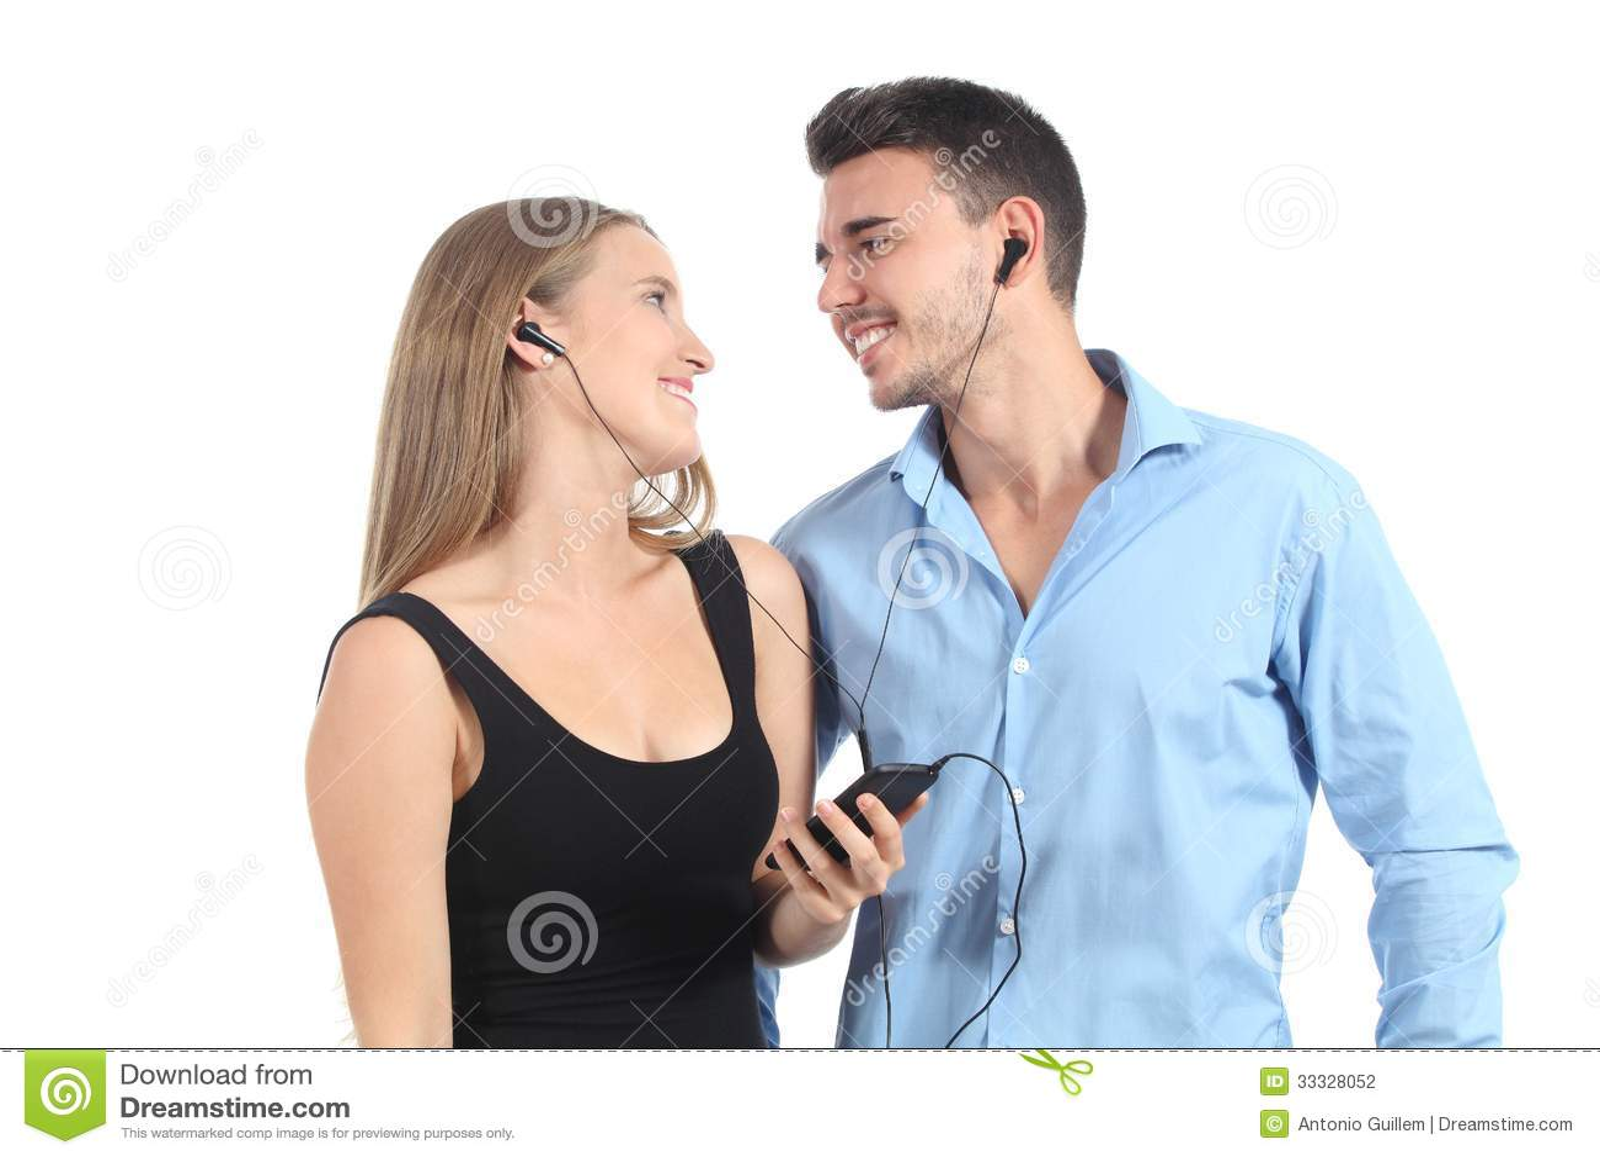 Essex dating evenemang